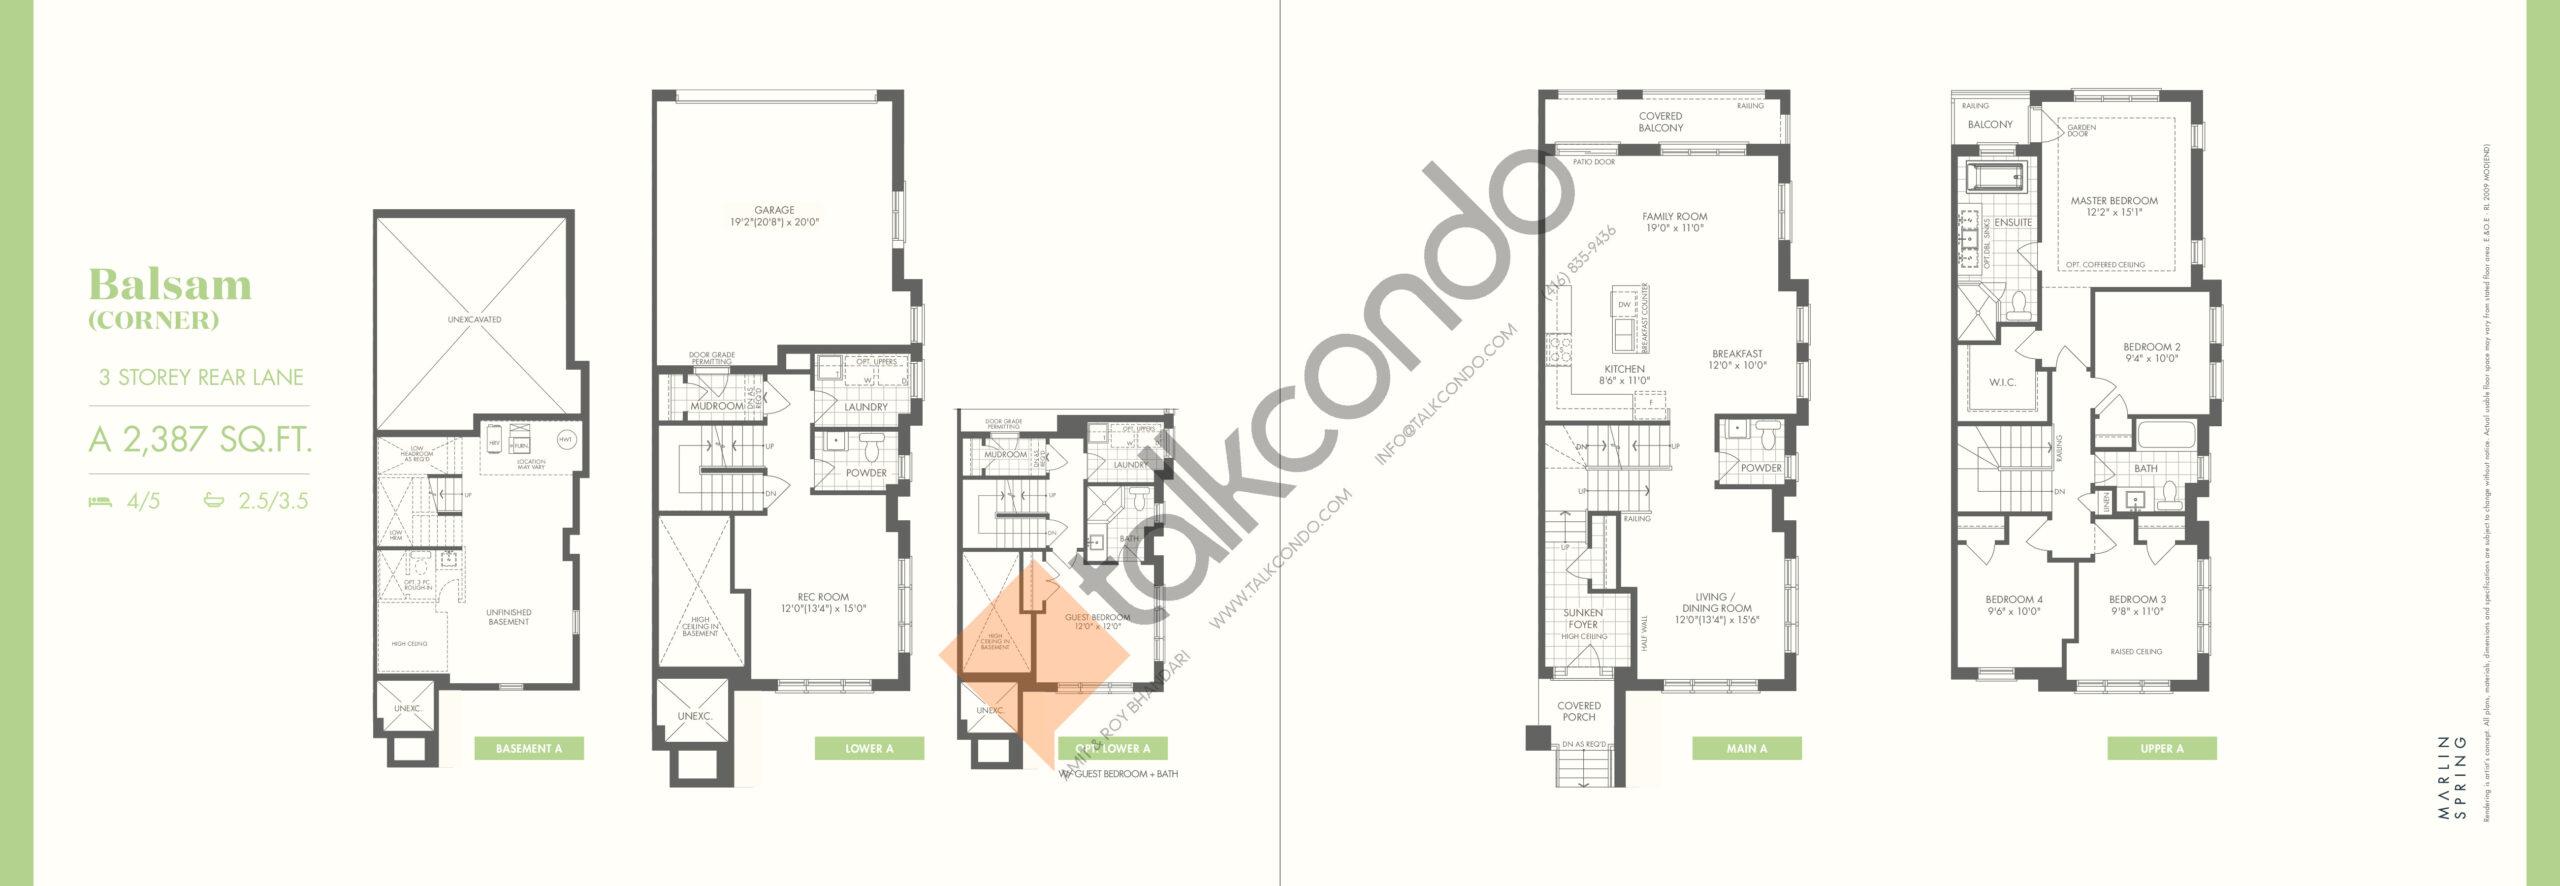 Balsam (Corner) A Floor Plan at Ivylea Towns - 2387 sq.ft